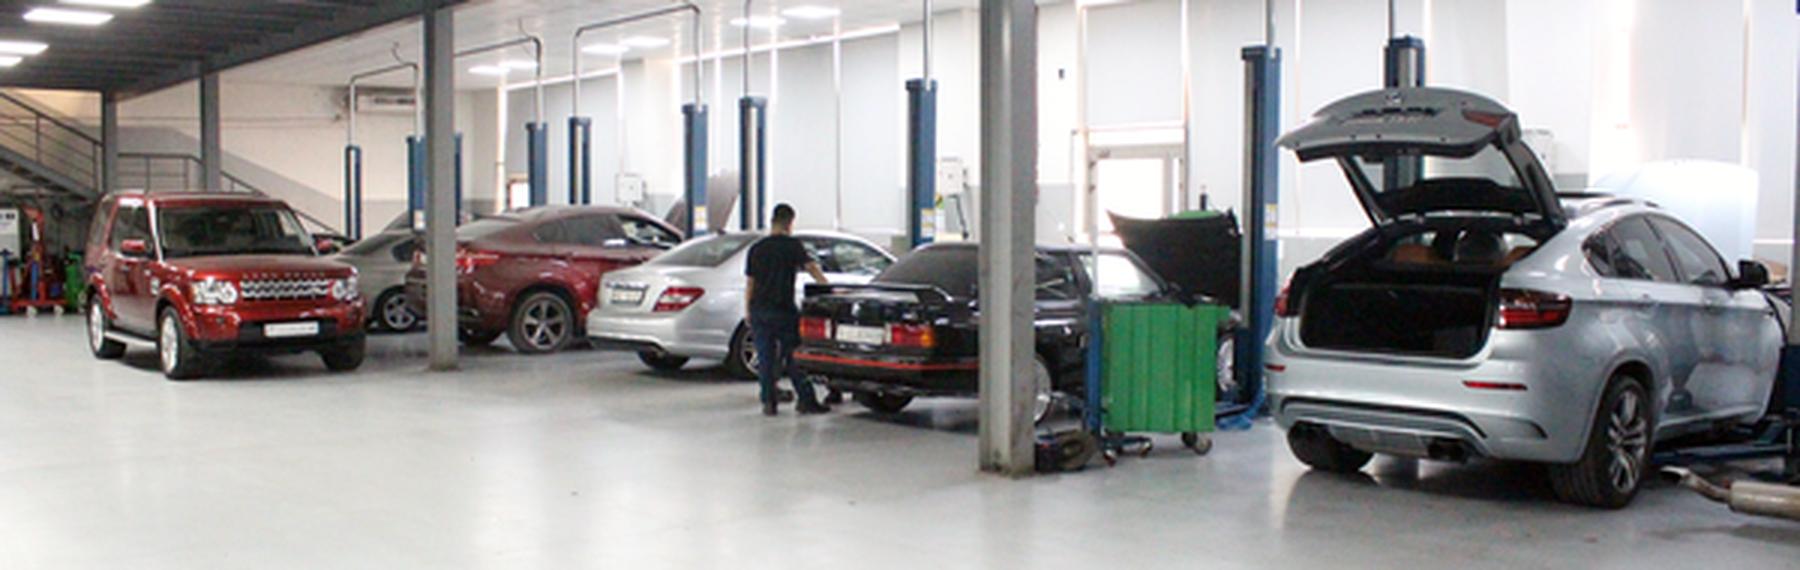 Car Repair & Service Workshop Munich Motor Works Supplier in  Dubai